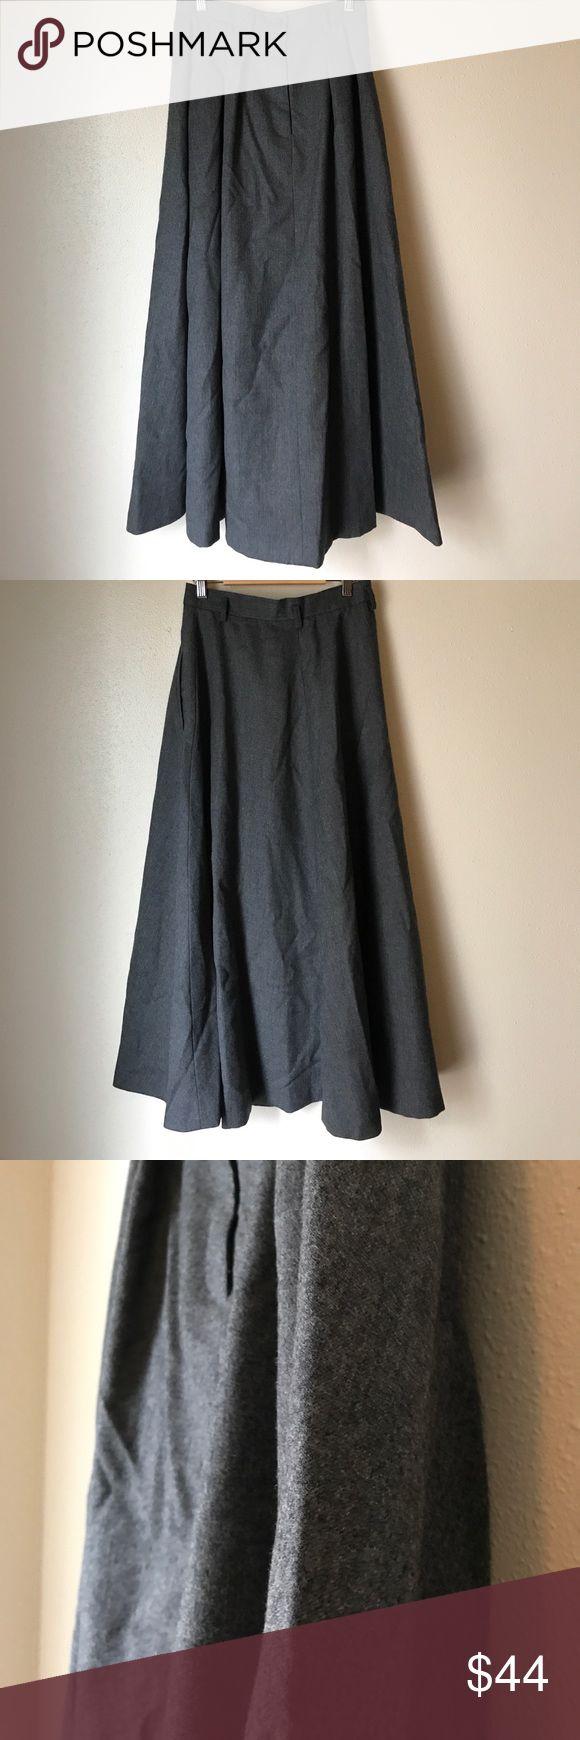 "Ralph Lauren Charcoal Grey Wool Maxi Skirt 100% Wool Maxi Skirt. Unlined US 10. Waist 13.5"" flat  Length 36"" long. No rips or stains. Belt looks, two side pockets, Zip front and 1 button closure. Ralph Lauren Skirts Maxi"